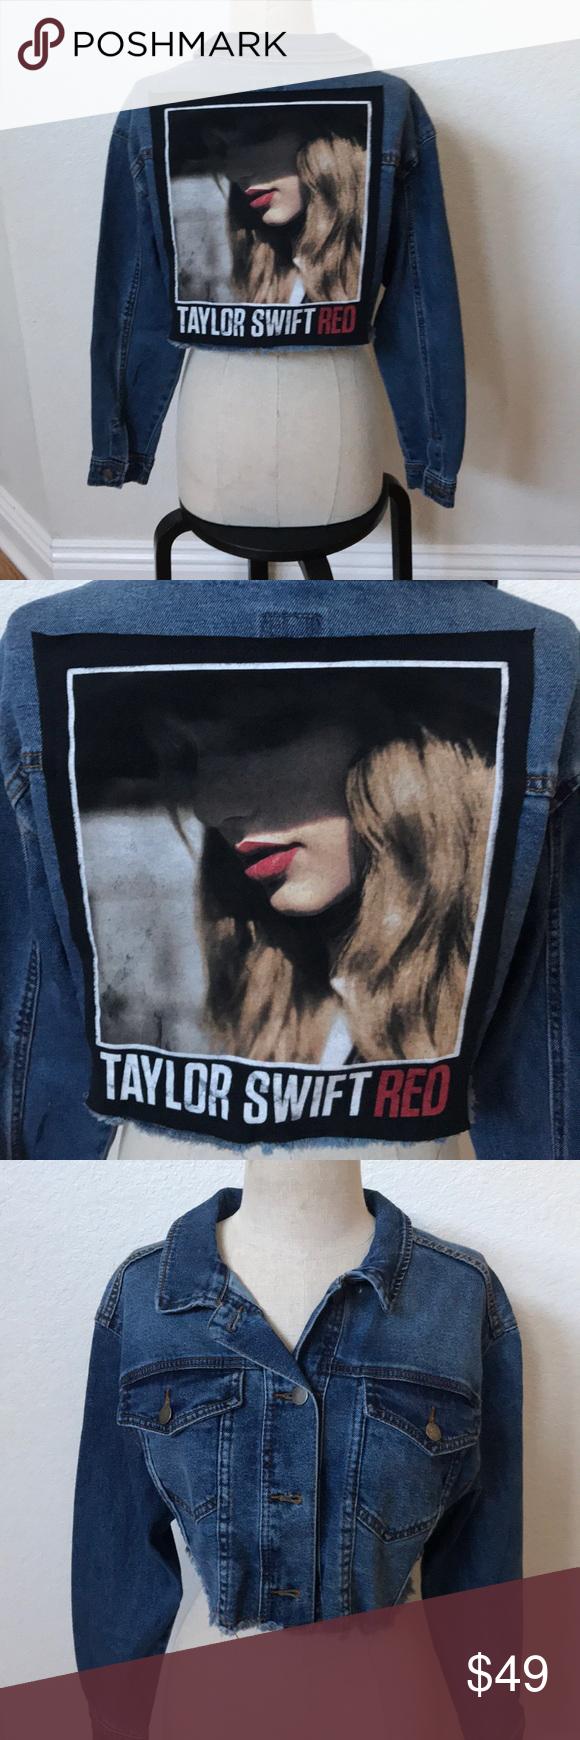 Taylor Swift Upcycled Jean Jacket Small Nwt Upcycle Jeans Jean Jacket Jackets [ 1740 x 580 Pixel ]